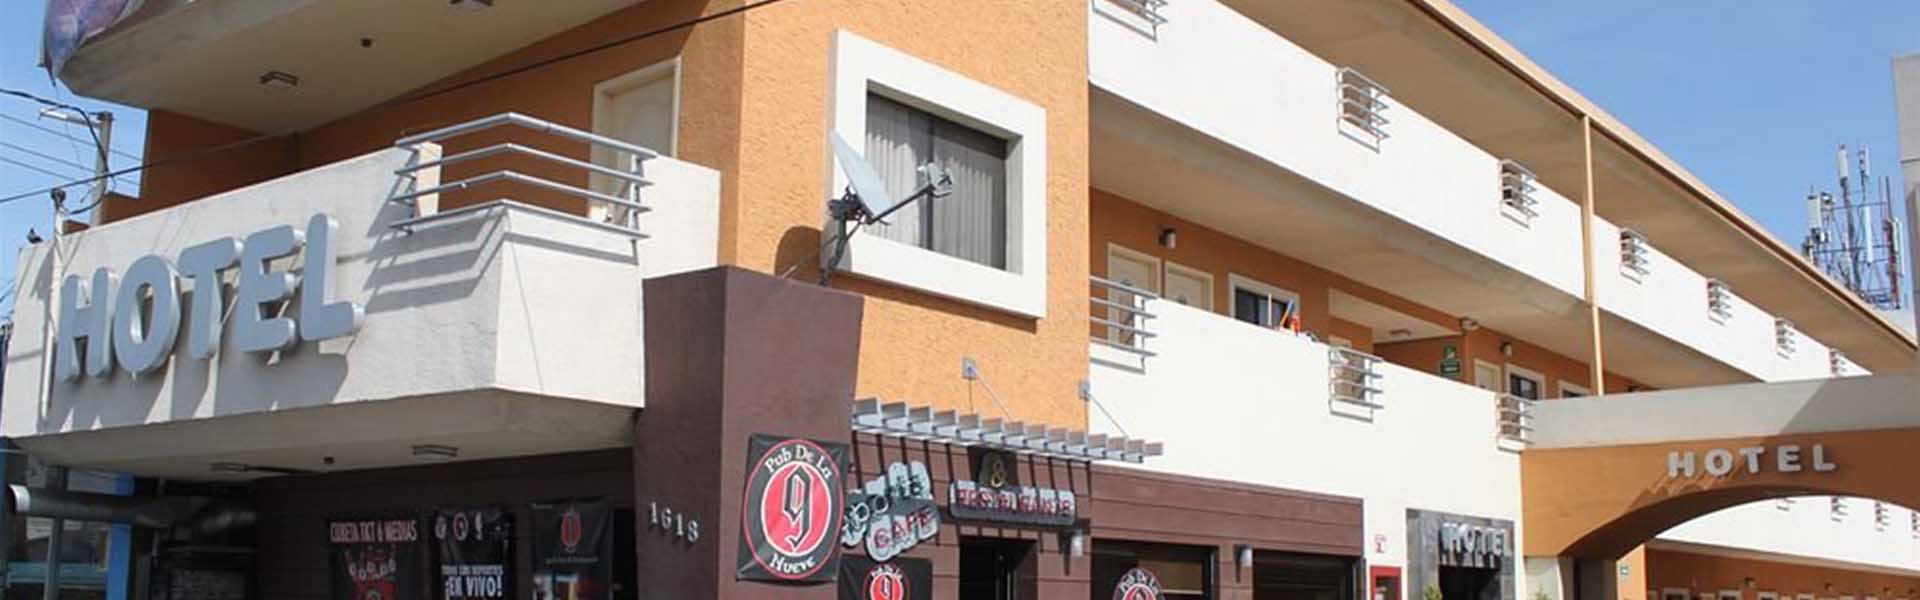 hotel-aqua-rio-tijuana